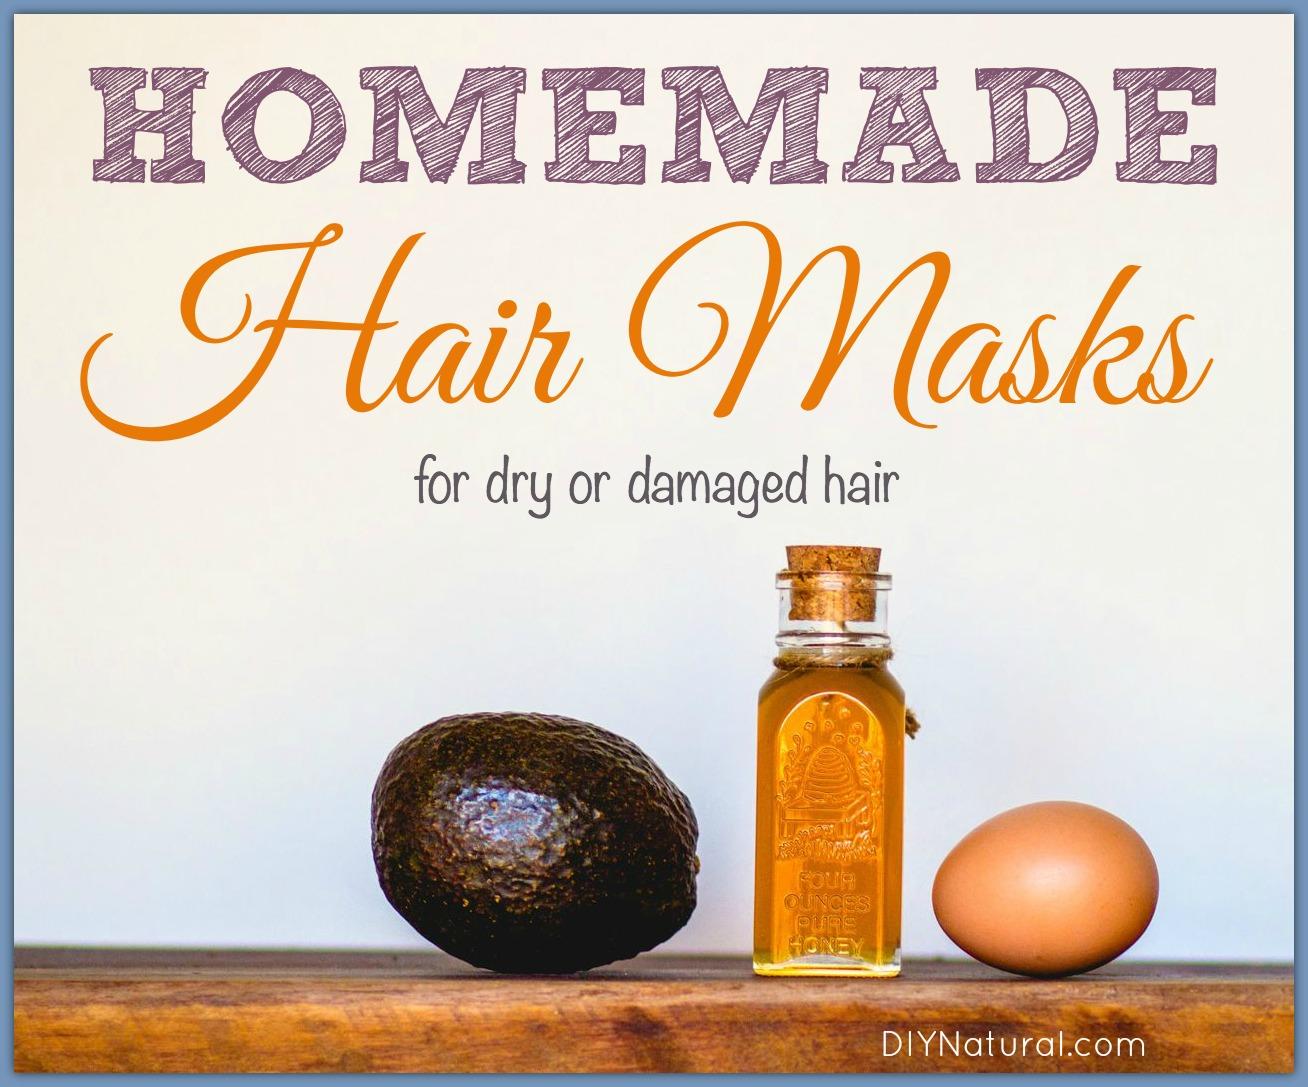 Homemade Hair Masks For Dry Or Damaged Hair